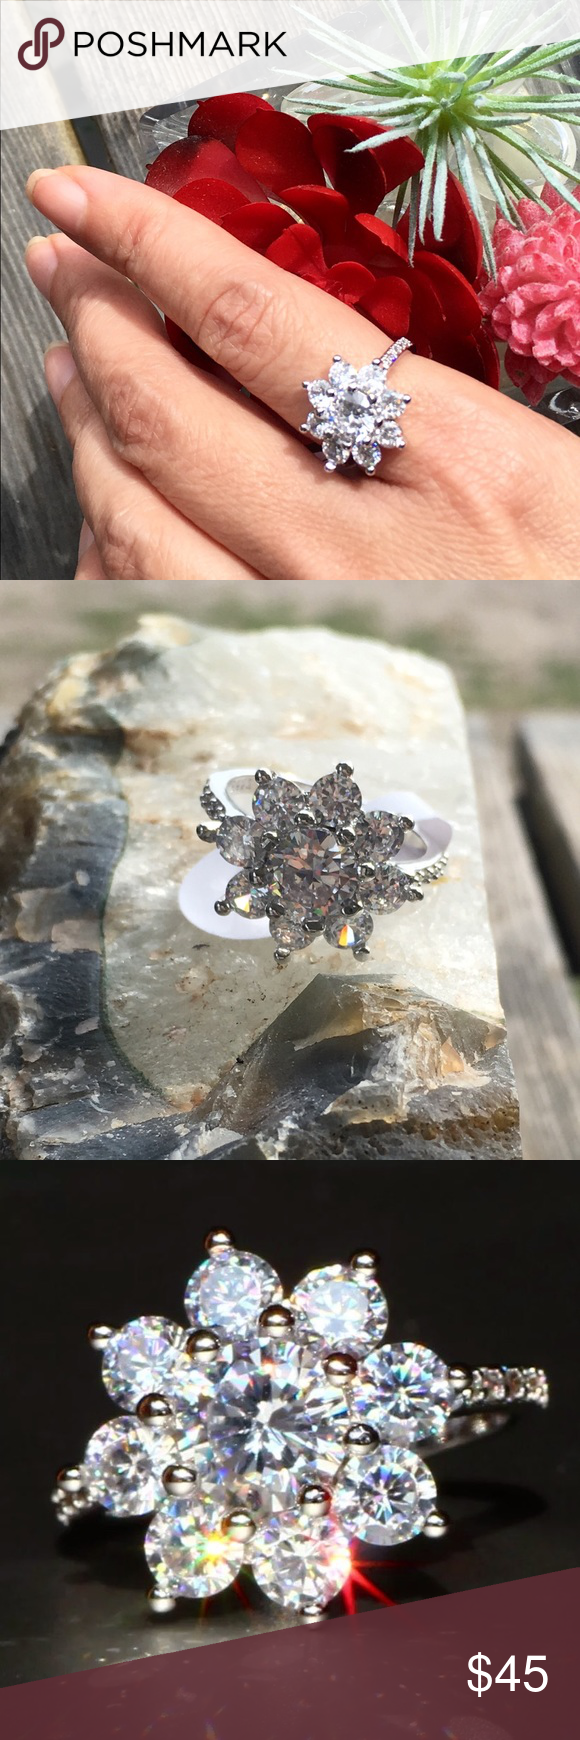 Dahlia Flower Ring Size 7 White Sapphire Jewelry Sapphire Jewelry Ring Dahlia Flower